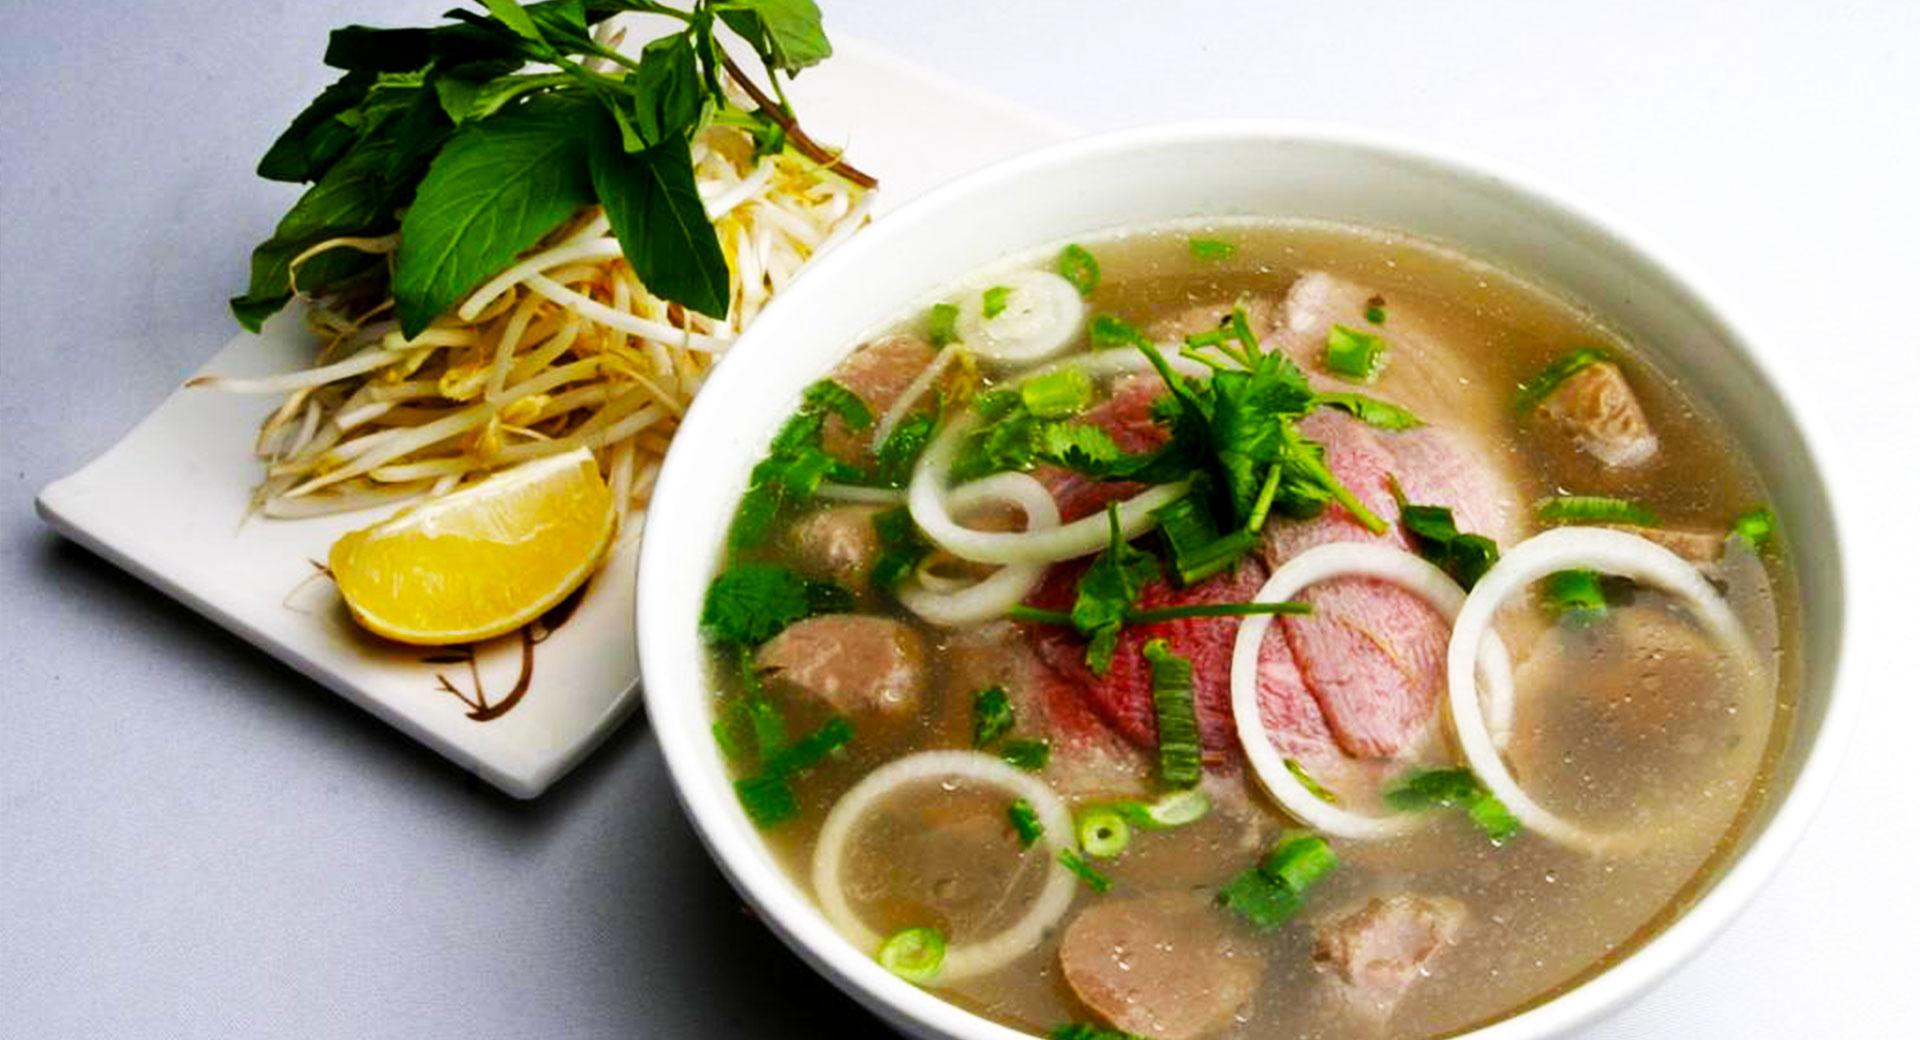 Reasons to visit Saigon